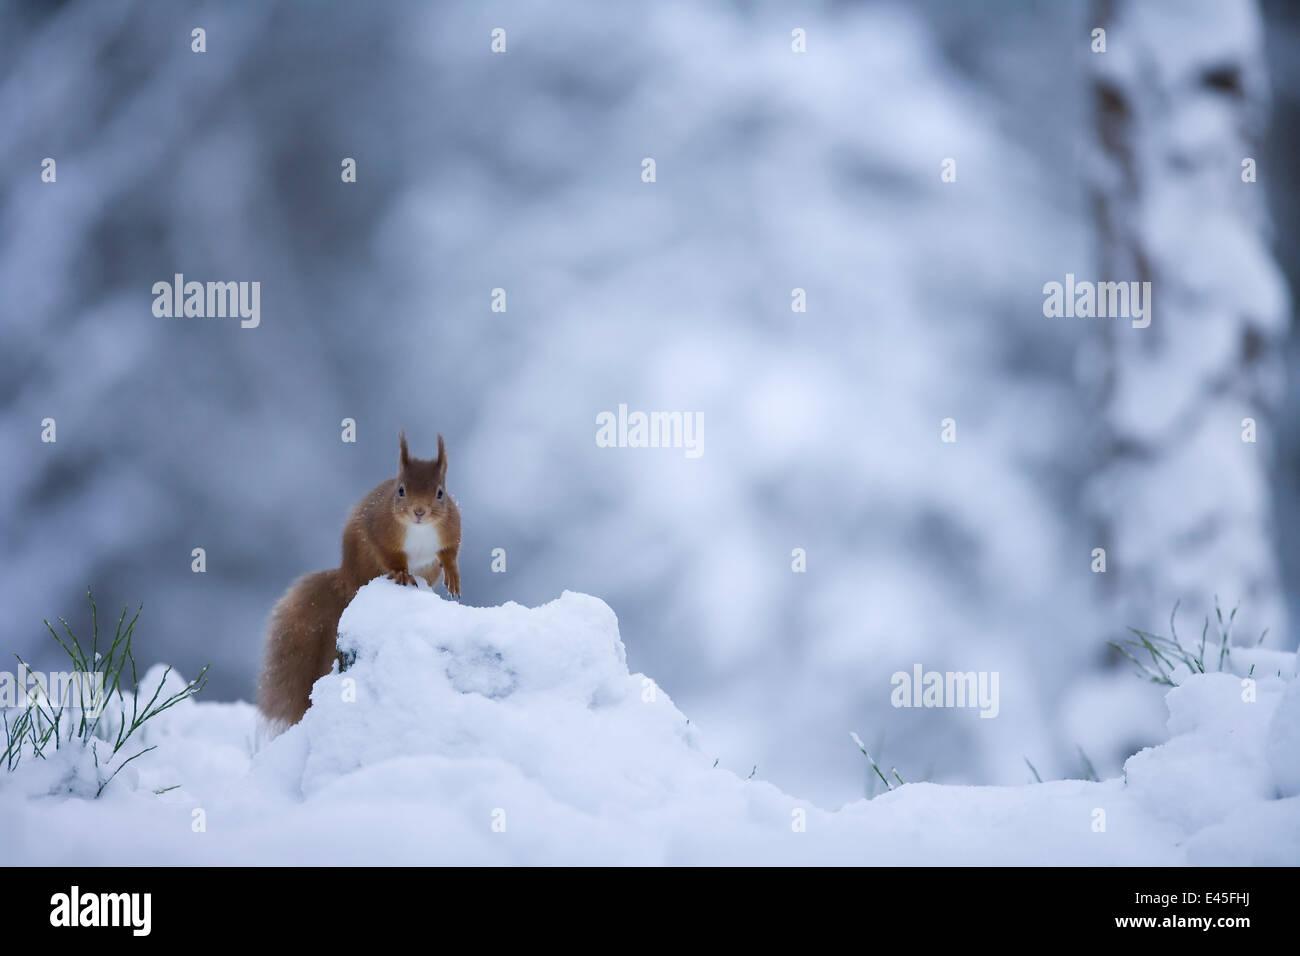 Red squirrel (Sciurus vulgaris) in snow, Glenfeshie, Cairngorms NP, Scotland, February 2009 - Stock Image